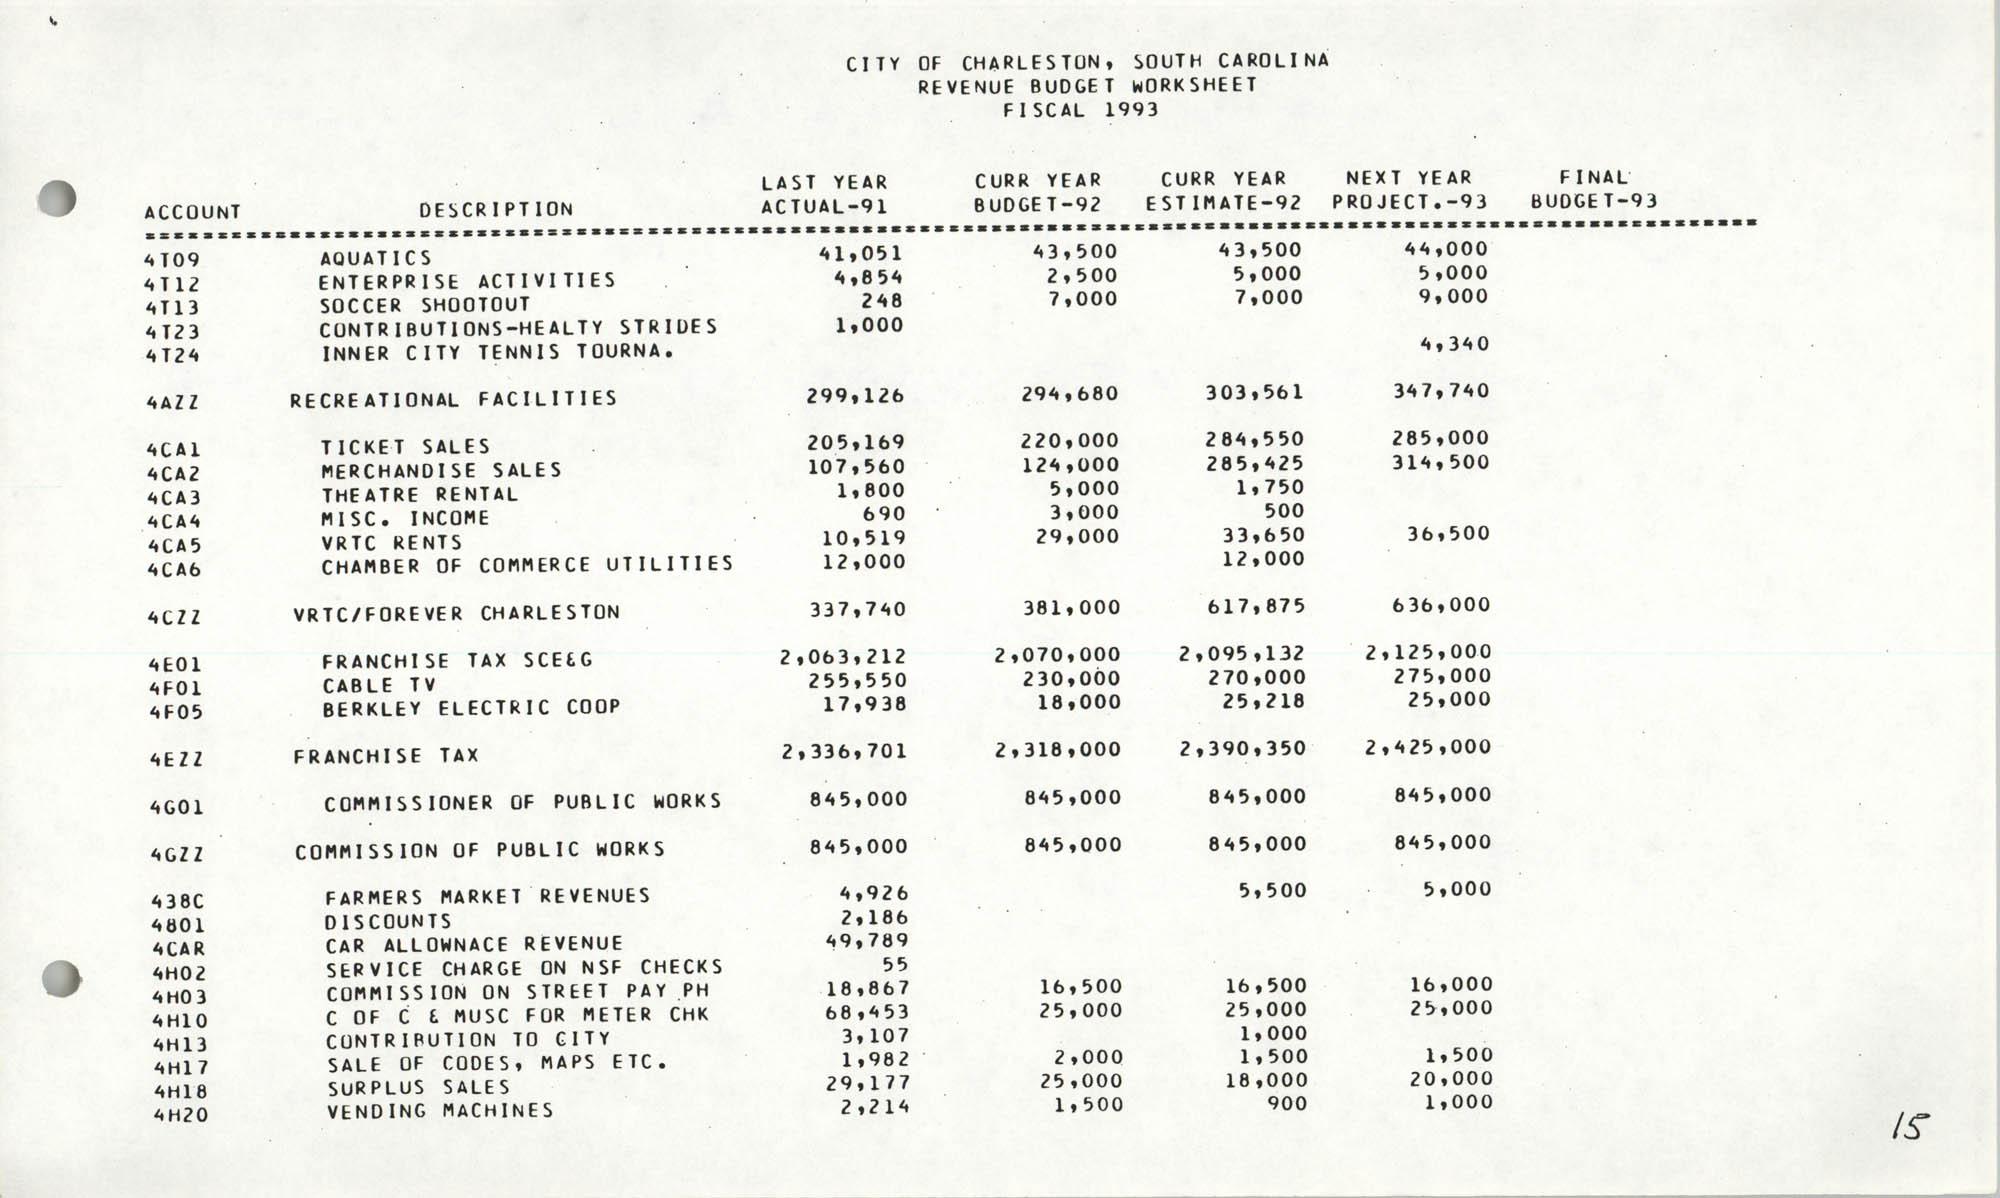 The City Council of Charleston, South Carolina, 1993 Budget, Page 15